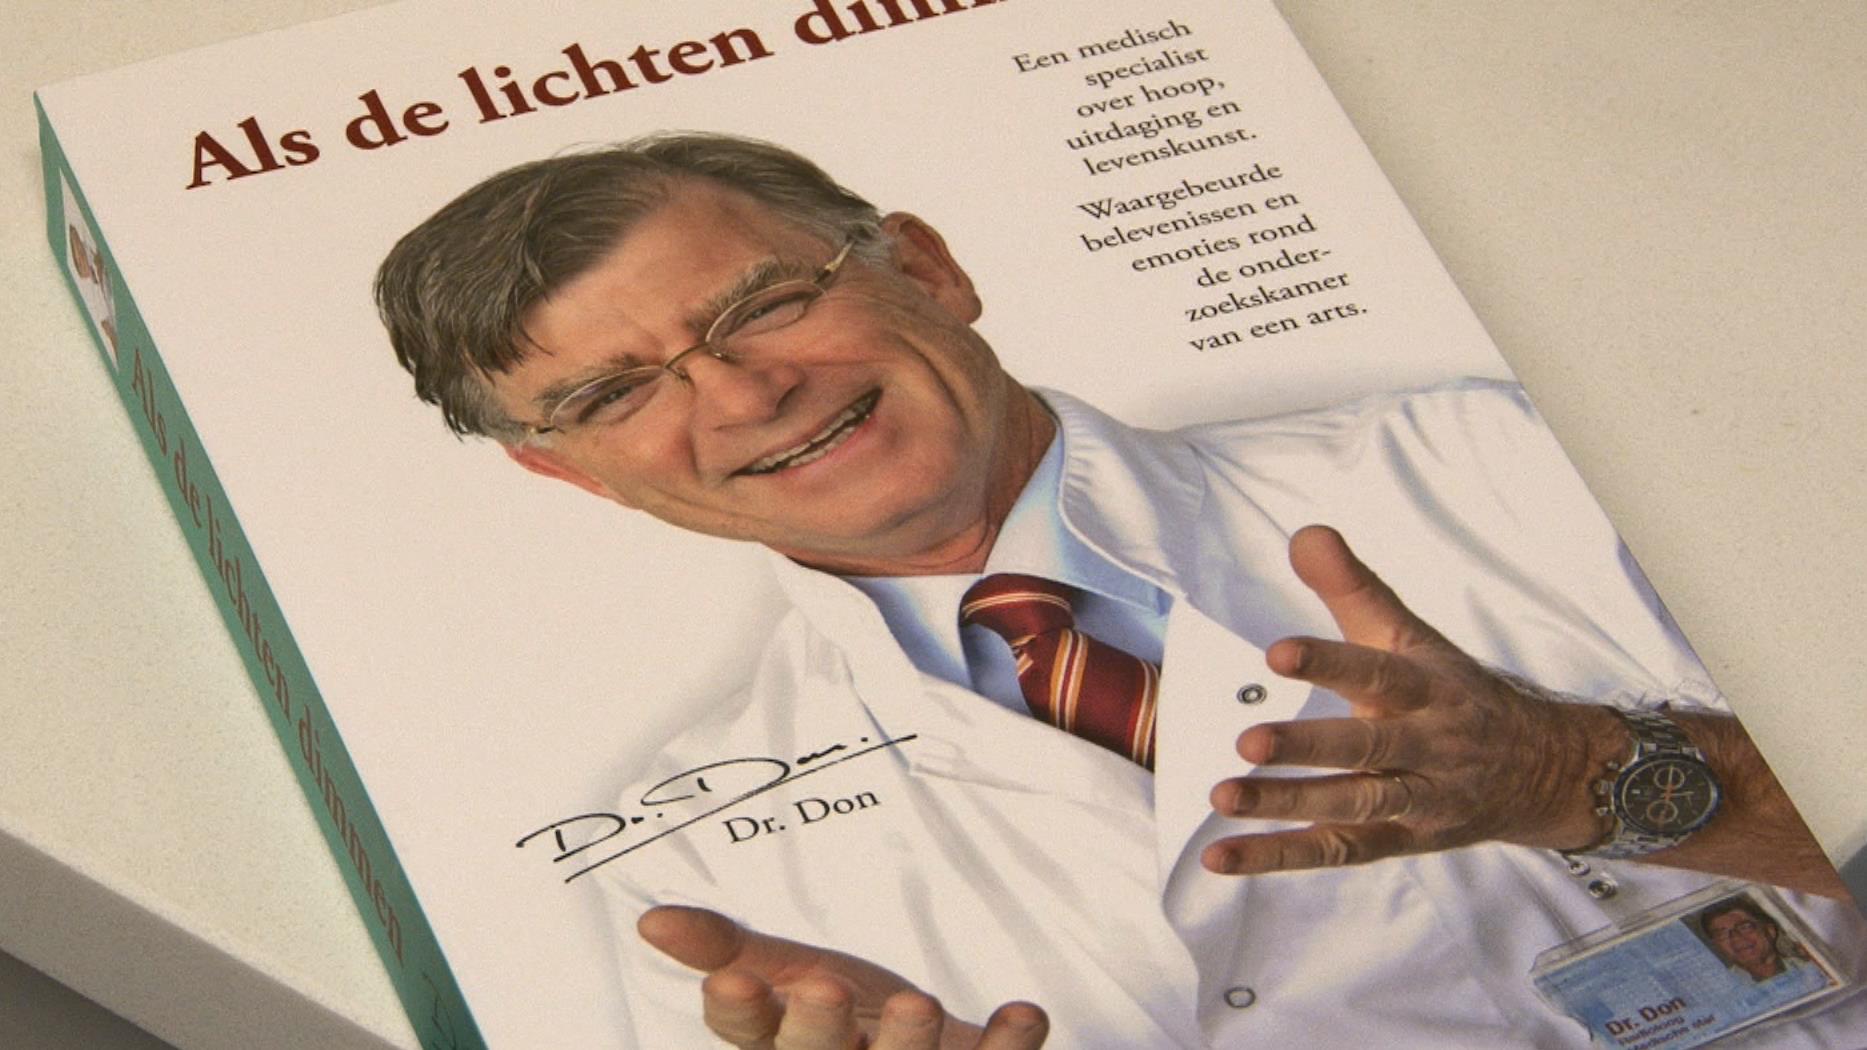 kliniek dr don hengelo